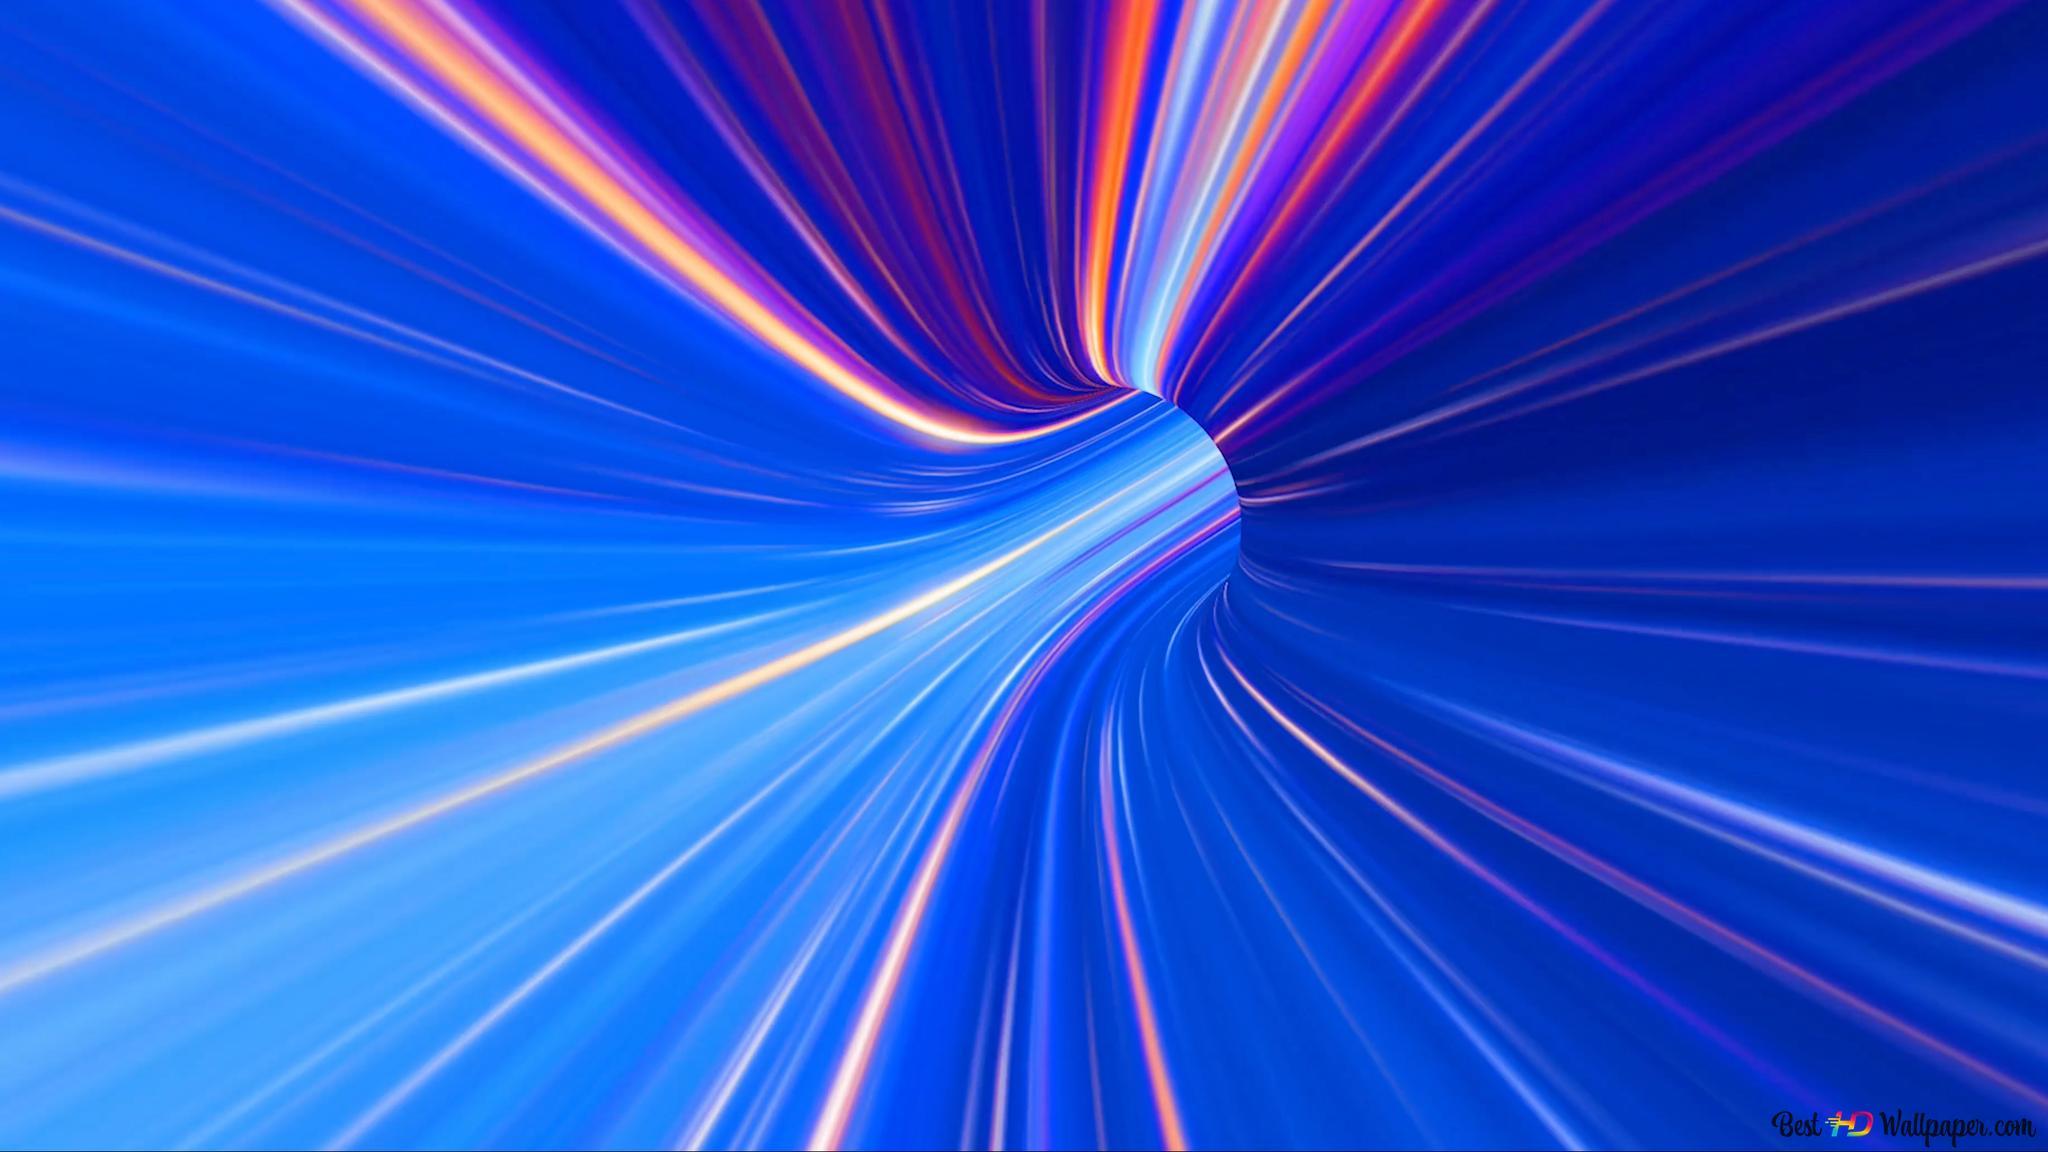 Tunnel Bleu Spectre Hd Fond Décran Télécharger